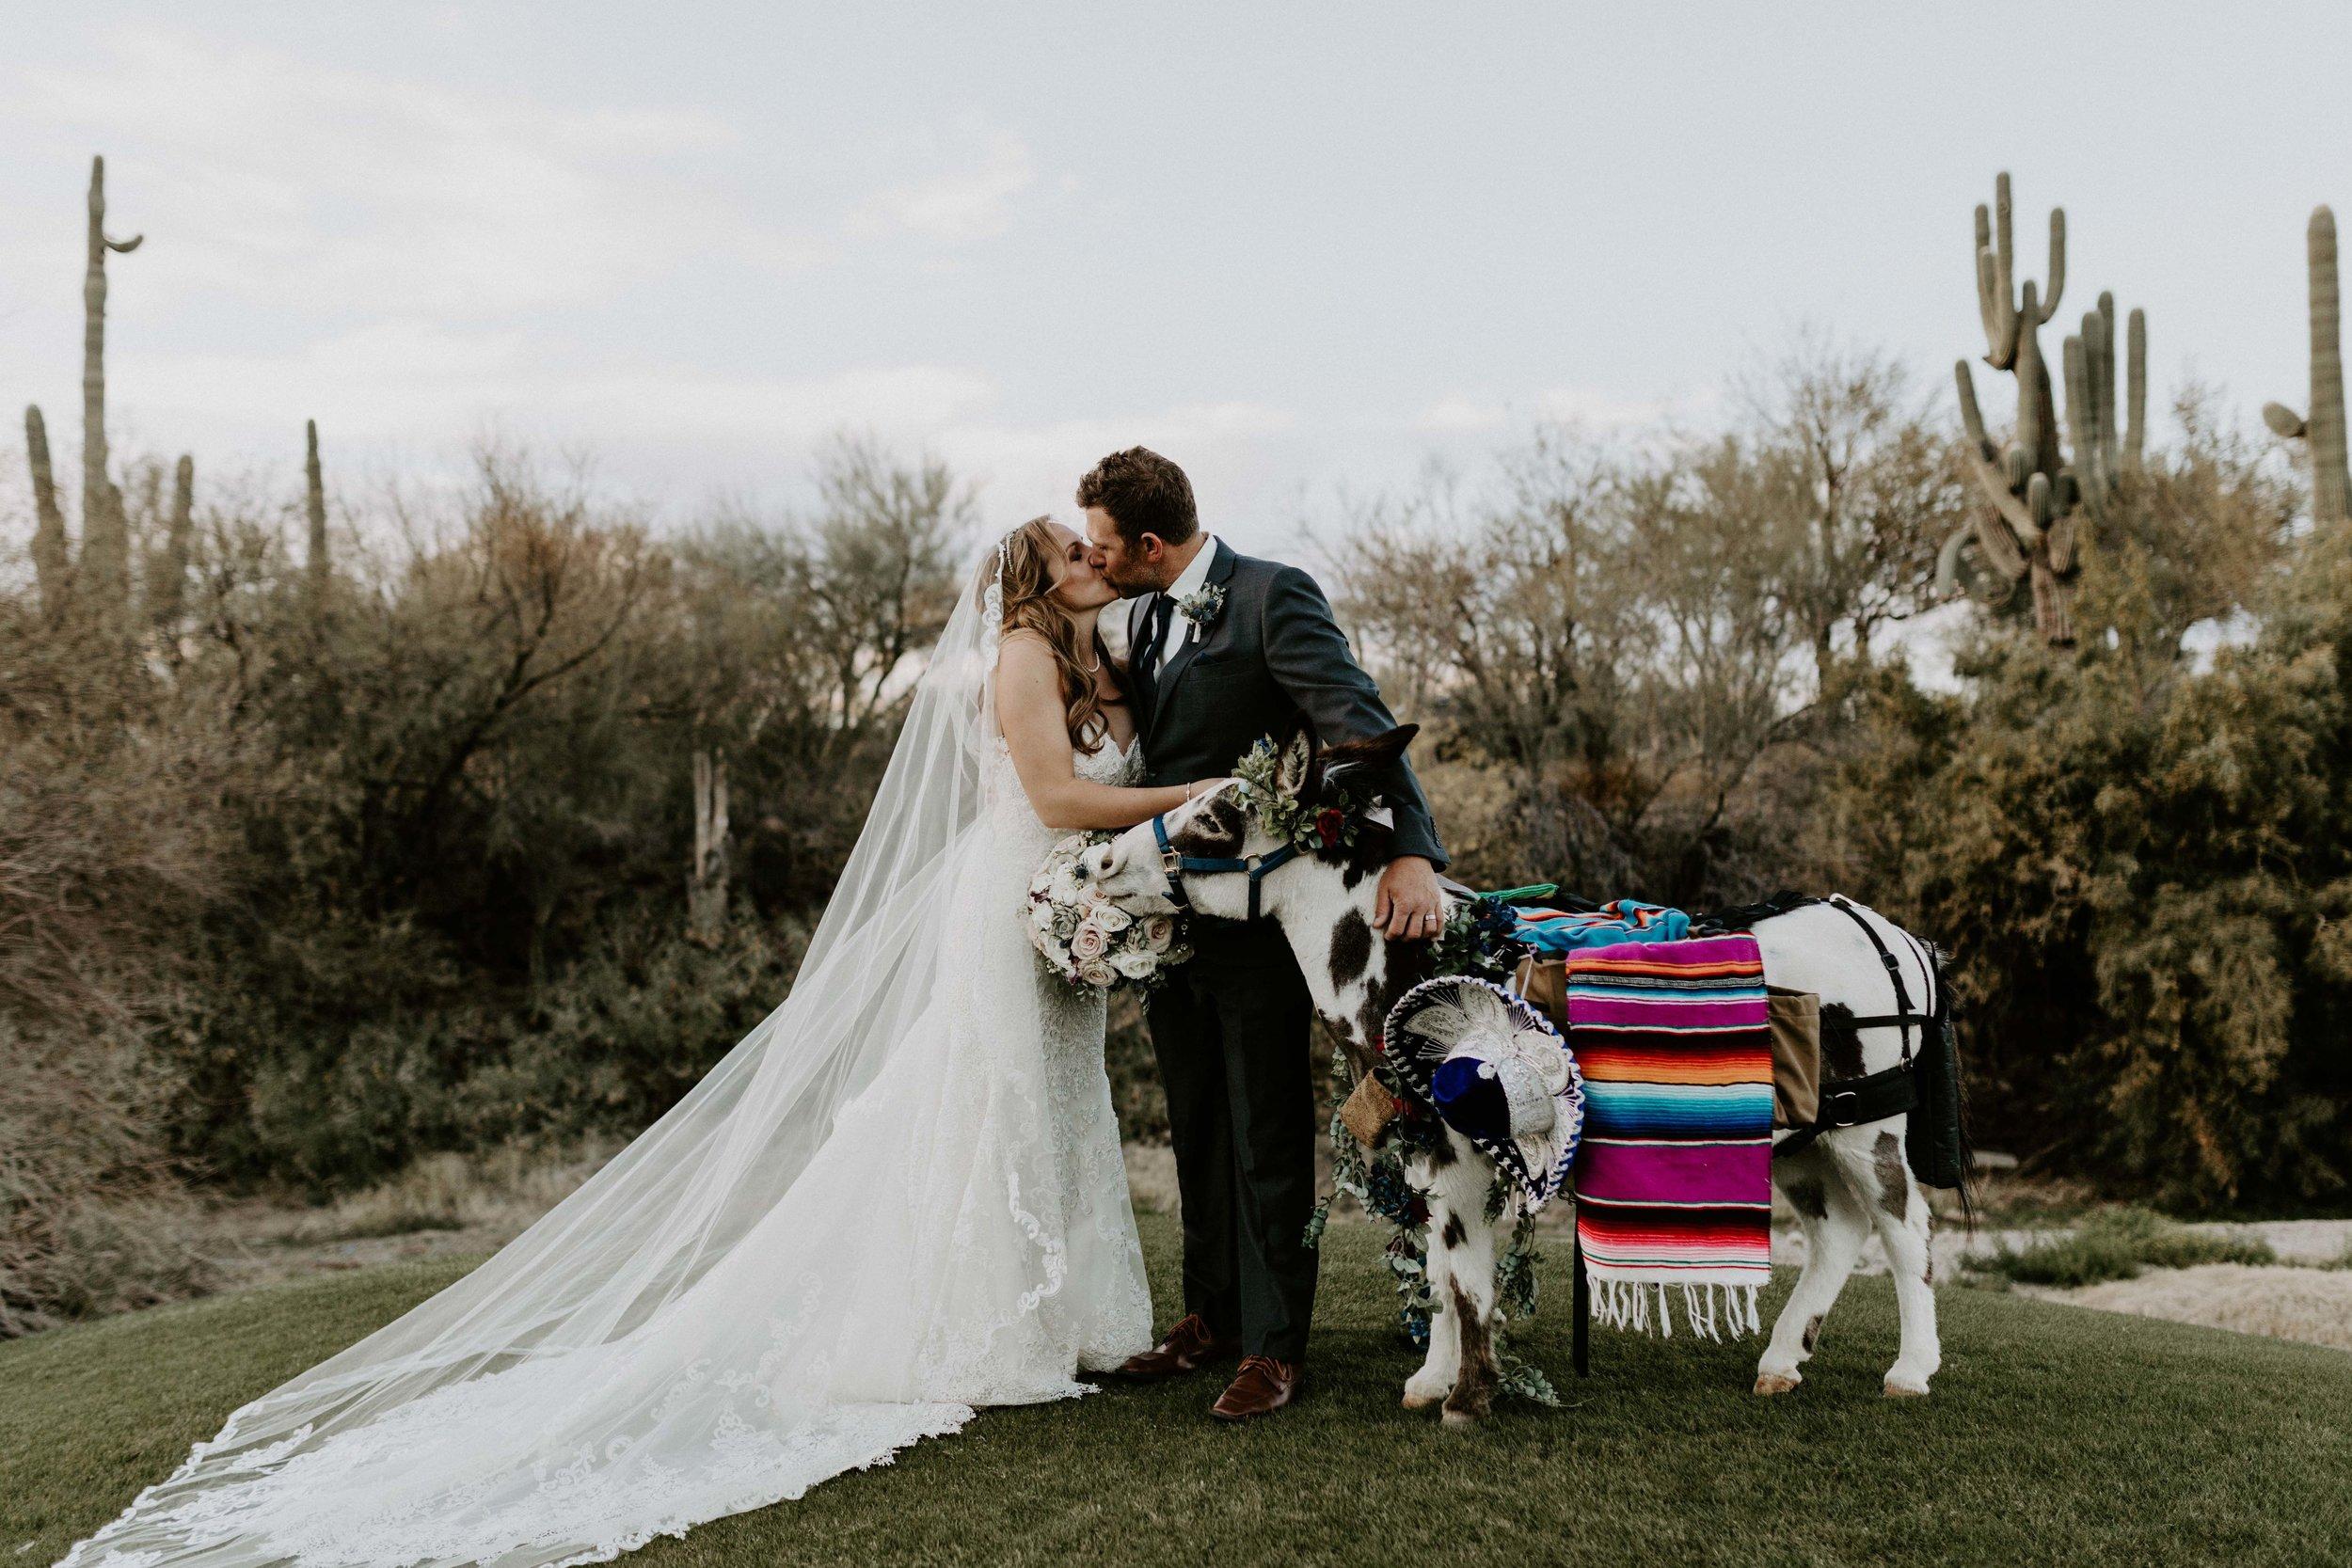 Bride and groom photos at Tonto Bar and Grill wedding venue in Arizona